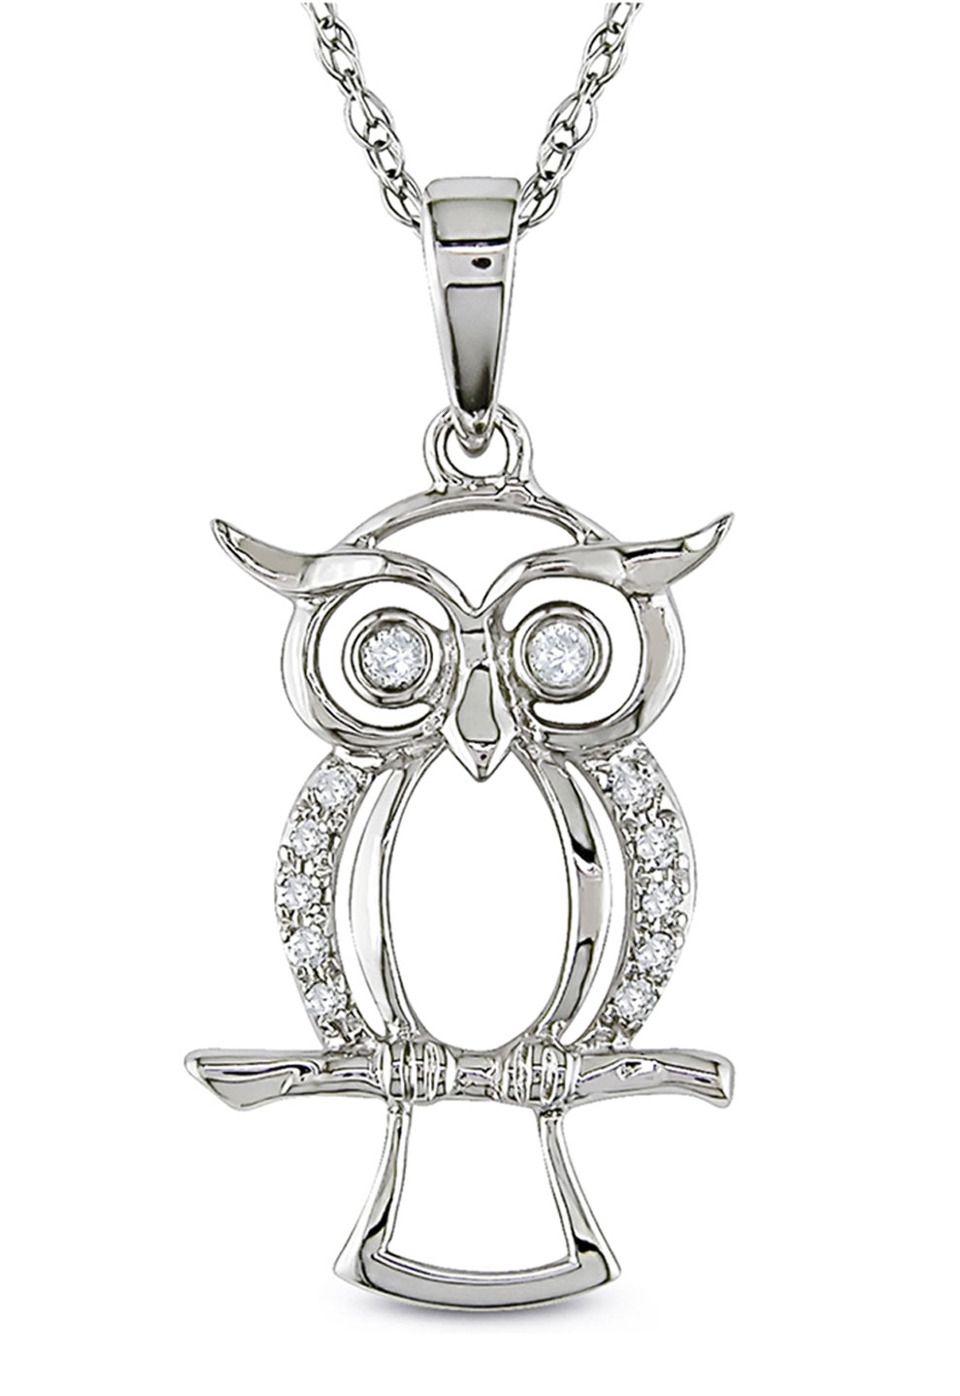 0.05 ct Diamond Owl Pendant in 10k White Gold